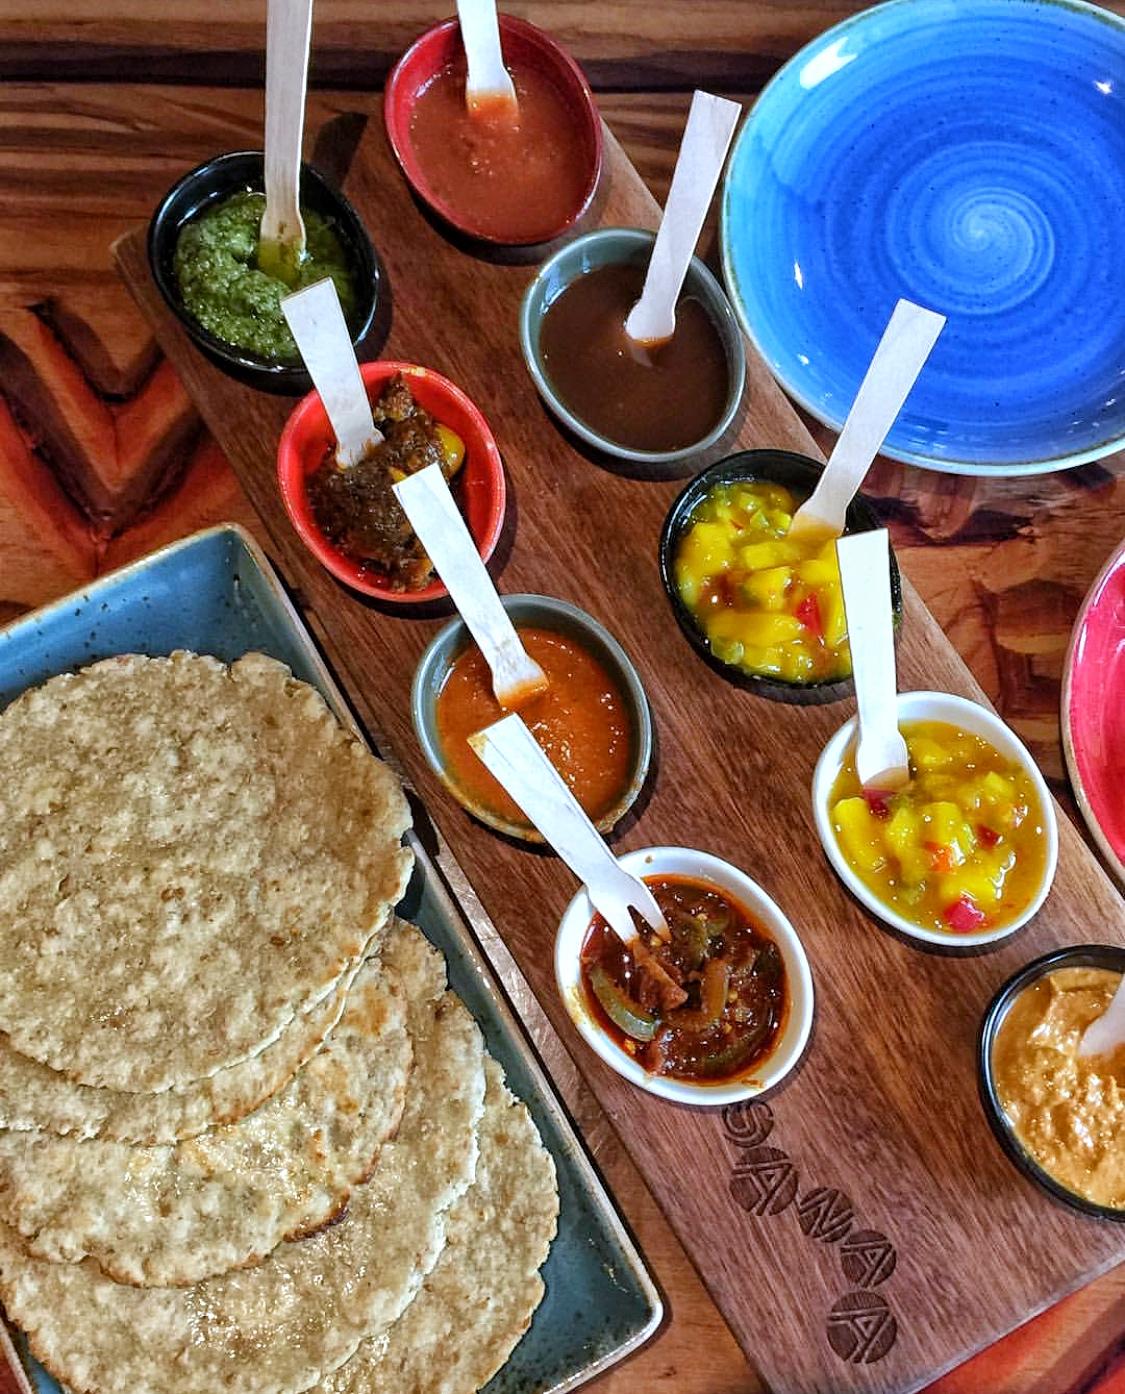 Vegan at Walt Disney World - Indian Style Bread Service at Sanaa in Animal Kingdom Lodge